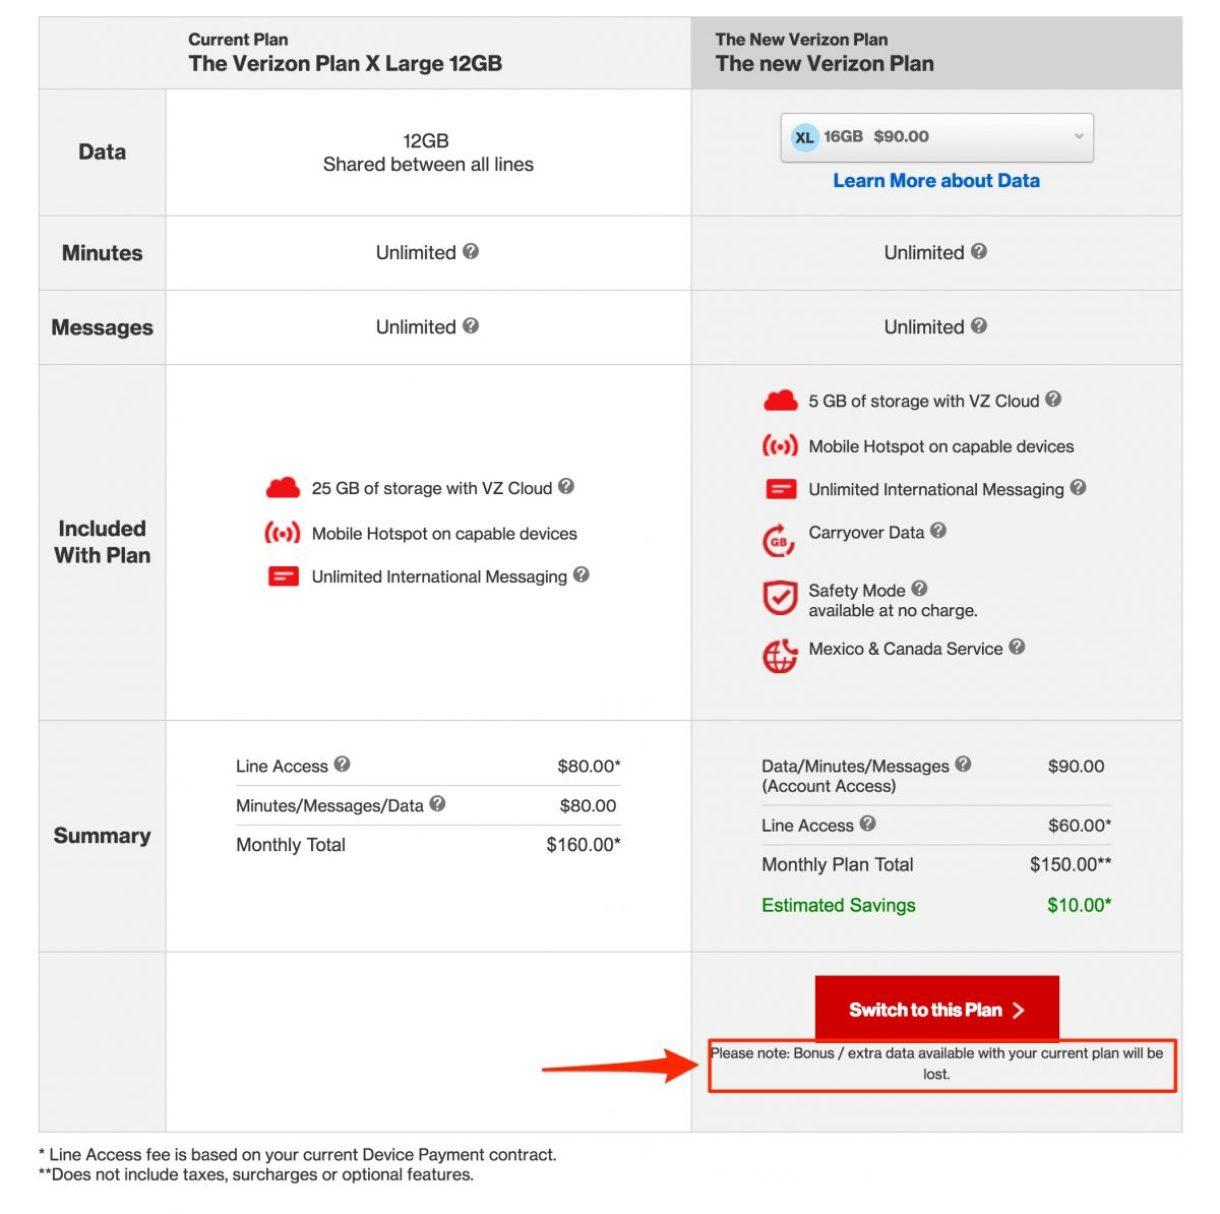 New Verizon Plans Now Live Should You Switch Or Wait